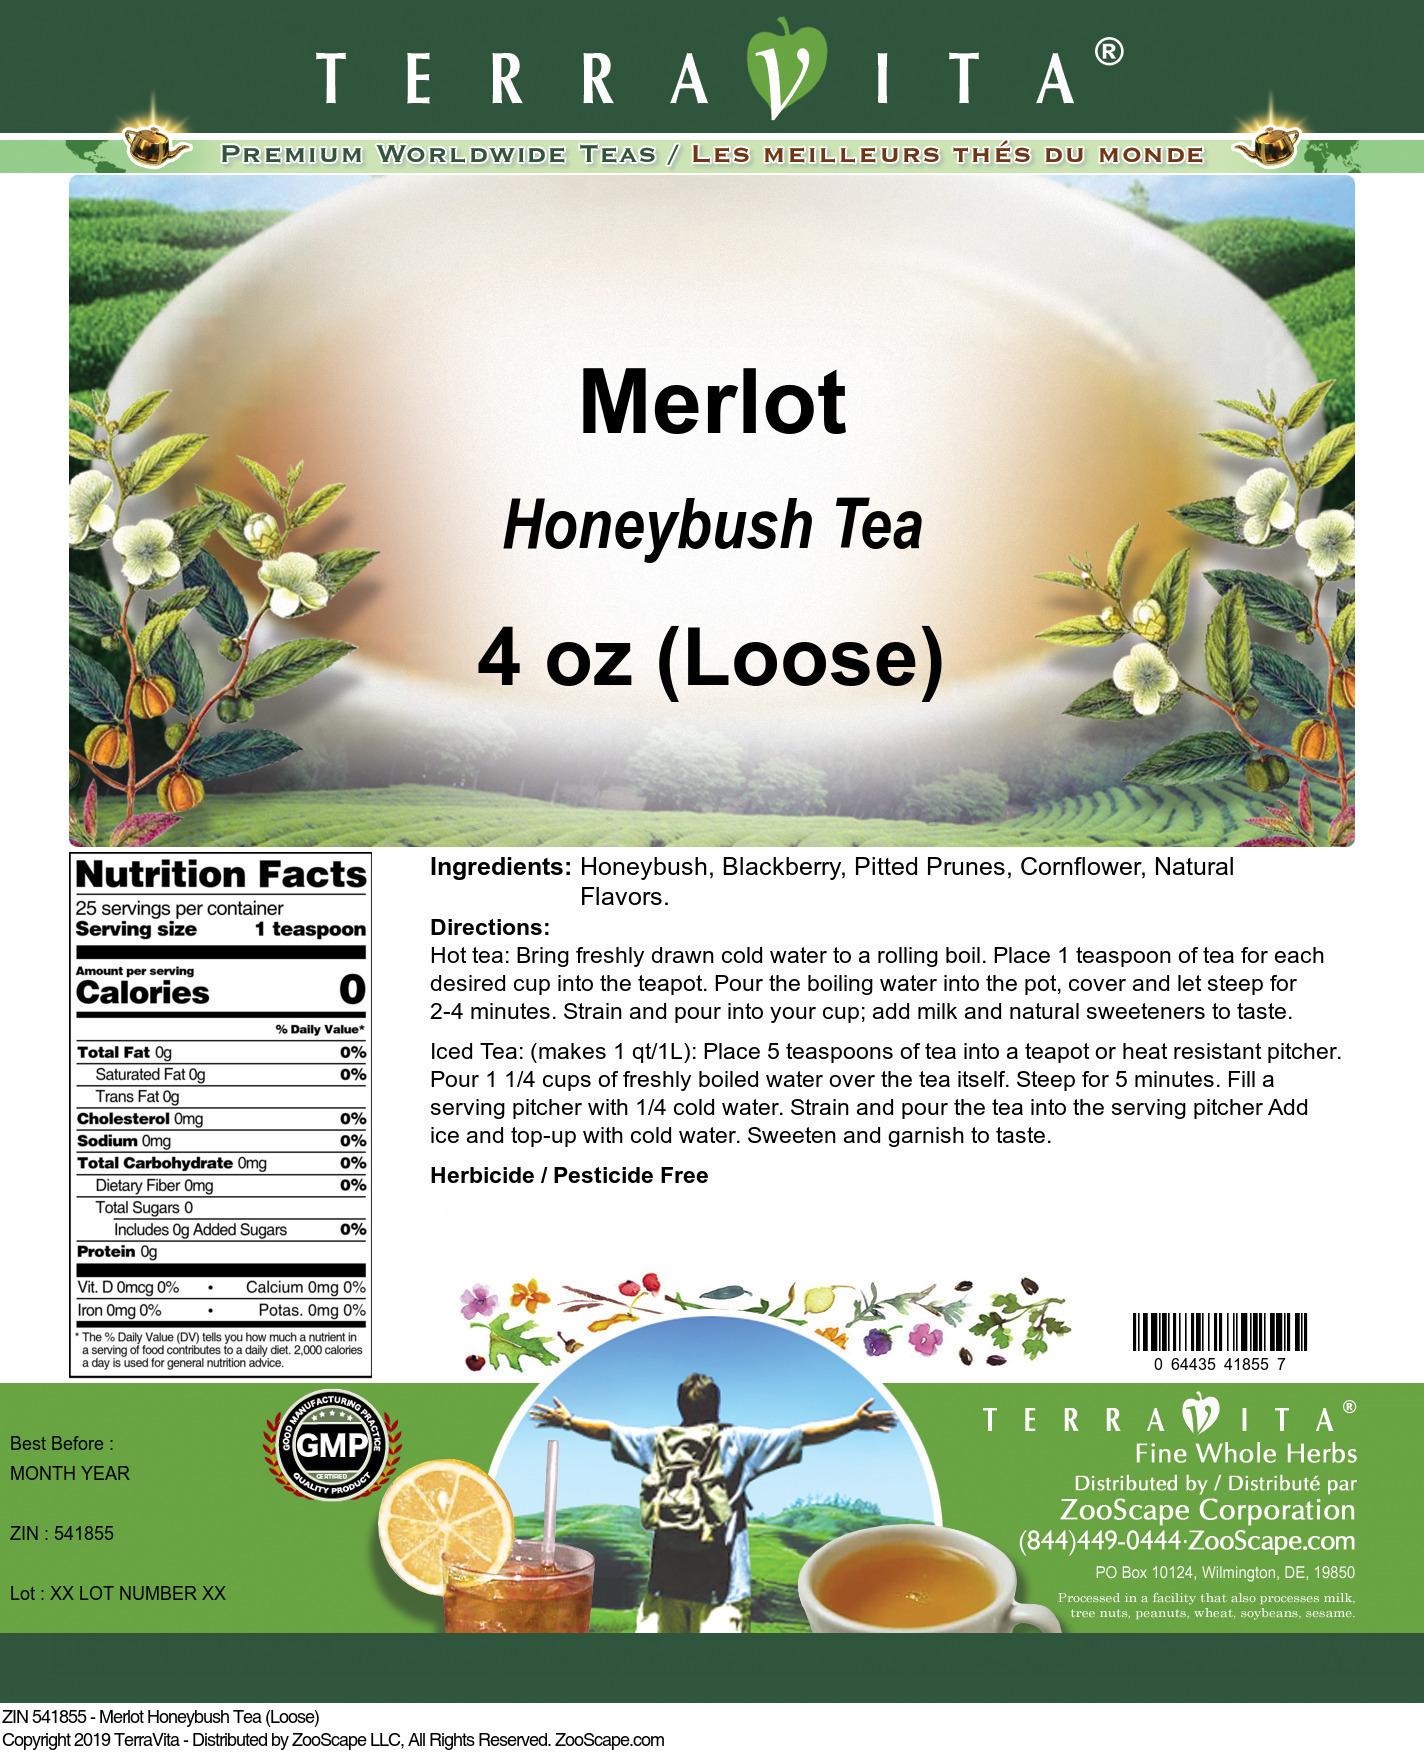 Merlot Honeybush Tea (Loose)